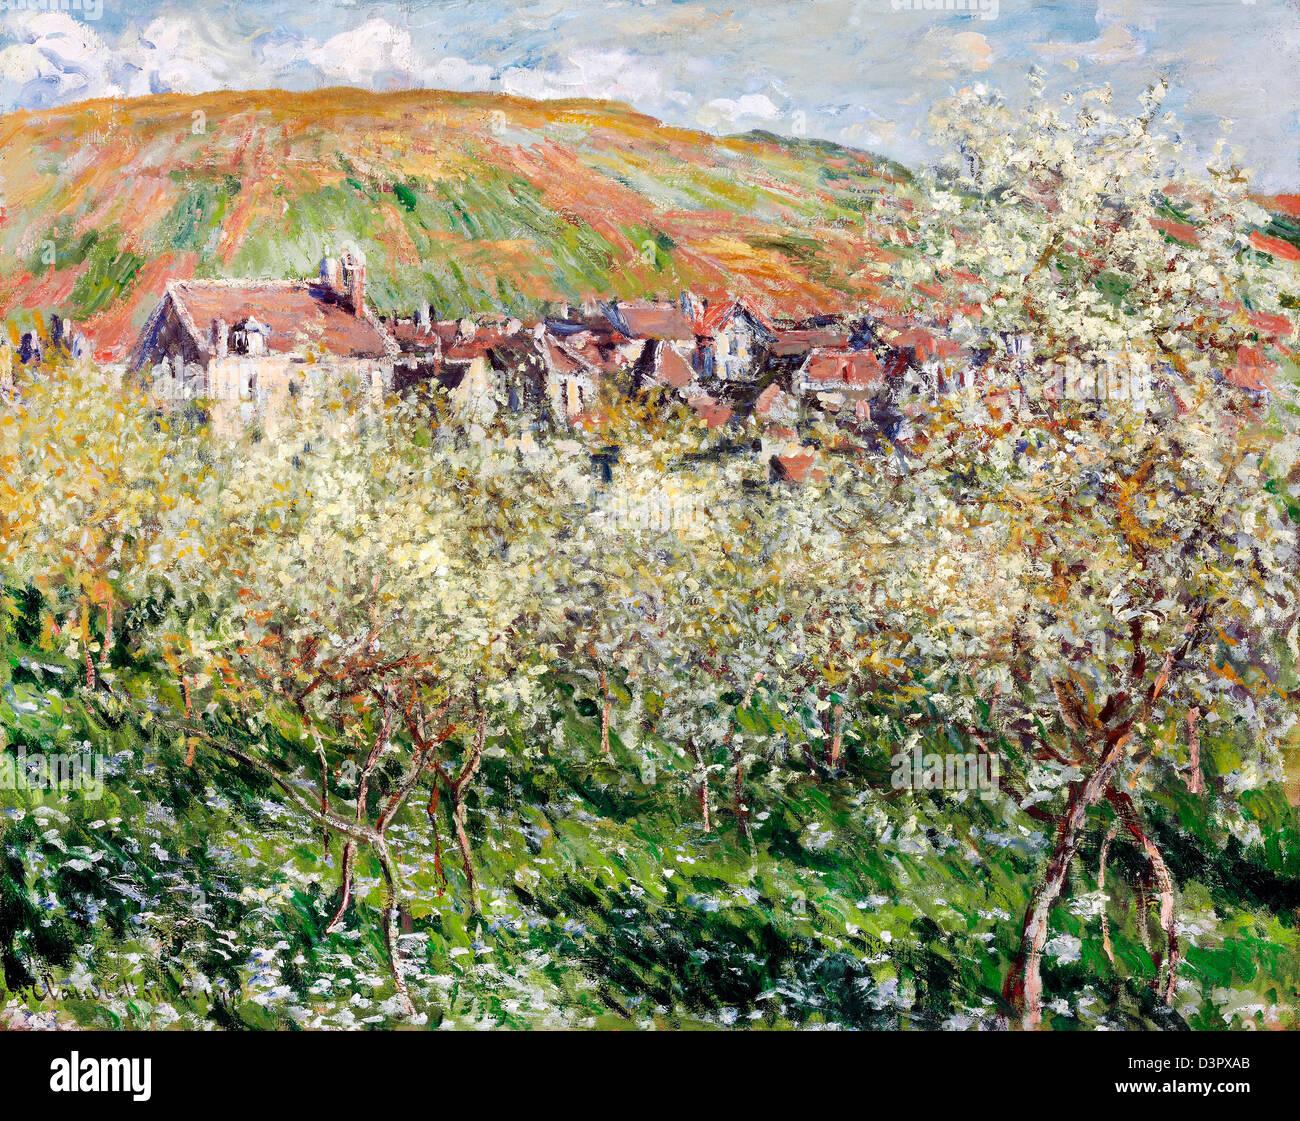 Claude Monet, Flowering Plum Trees 1879 Oil on canvas. Museum of Fine Arts, Budapest - Stock Image